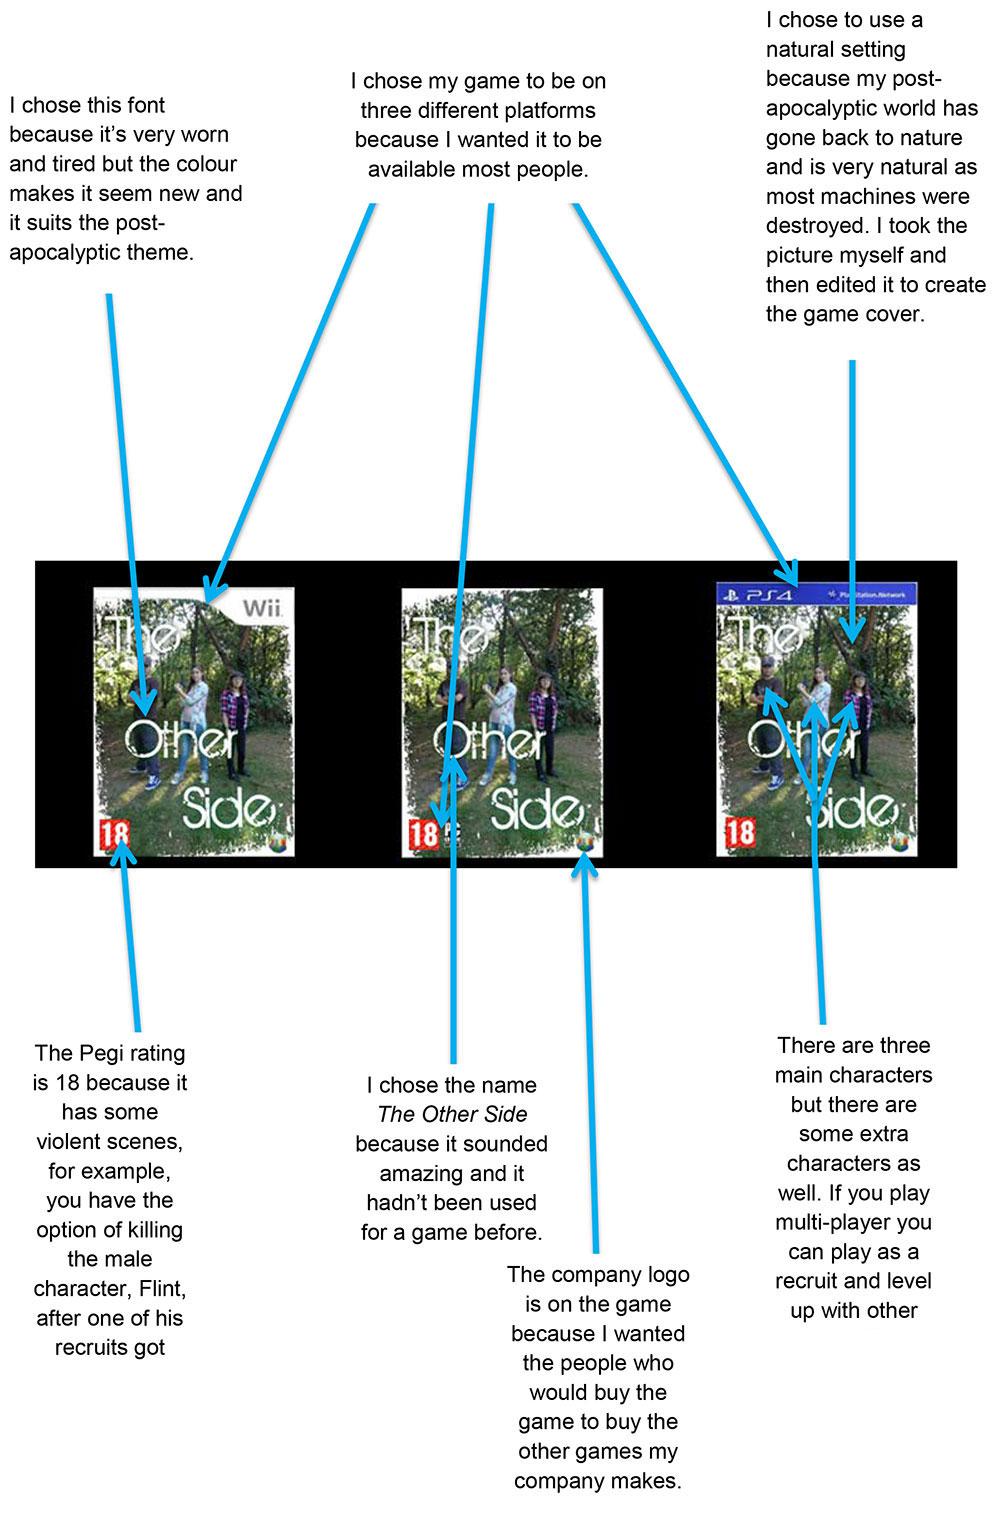 KS4 Student's Game Design